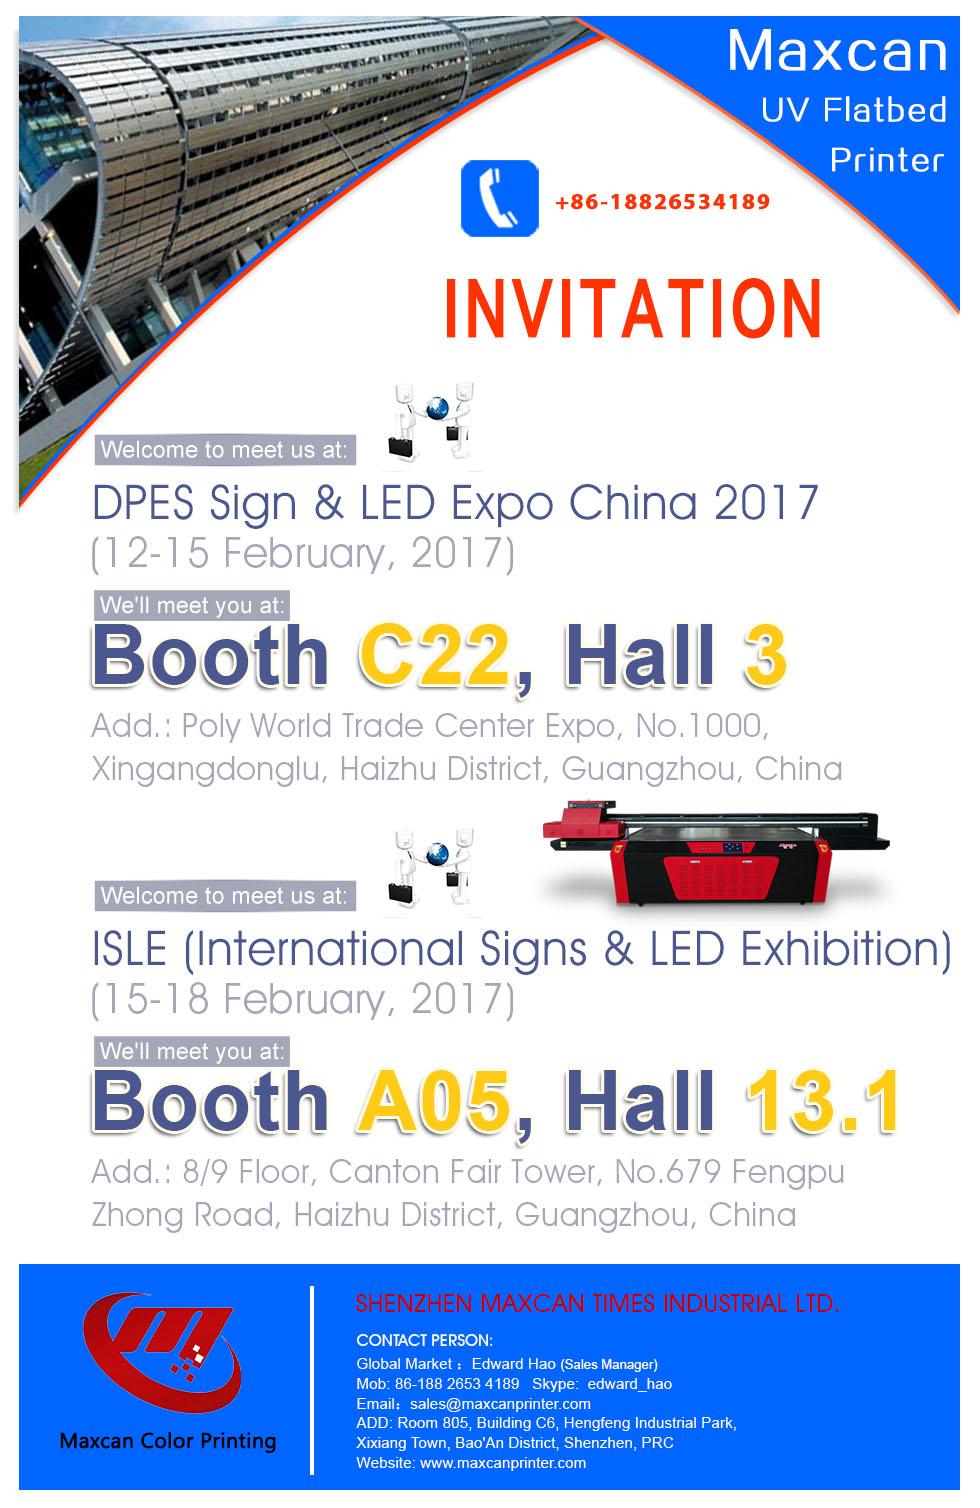 invitation of dpes and isle show